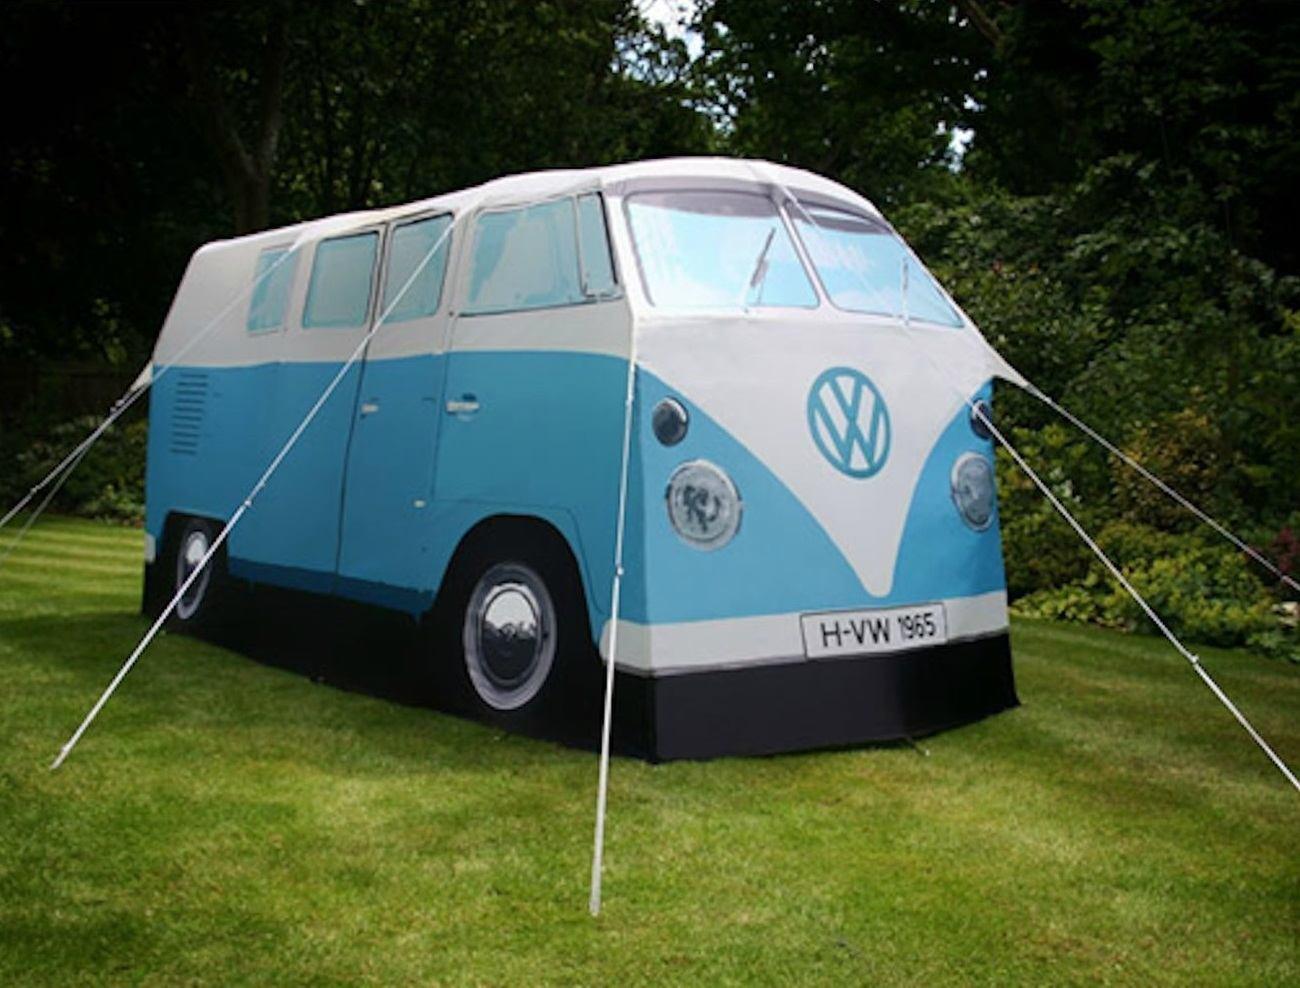 VW+Camper+Van+Tent